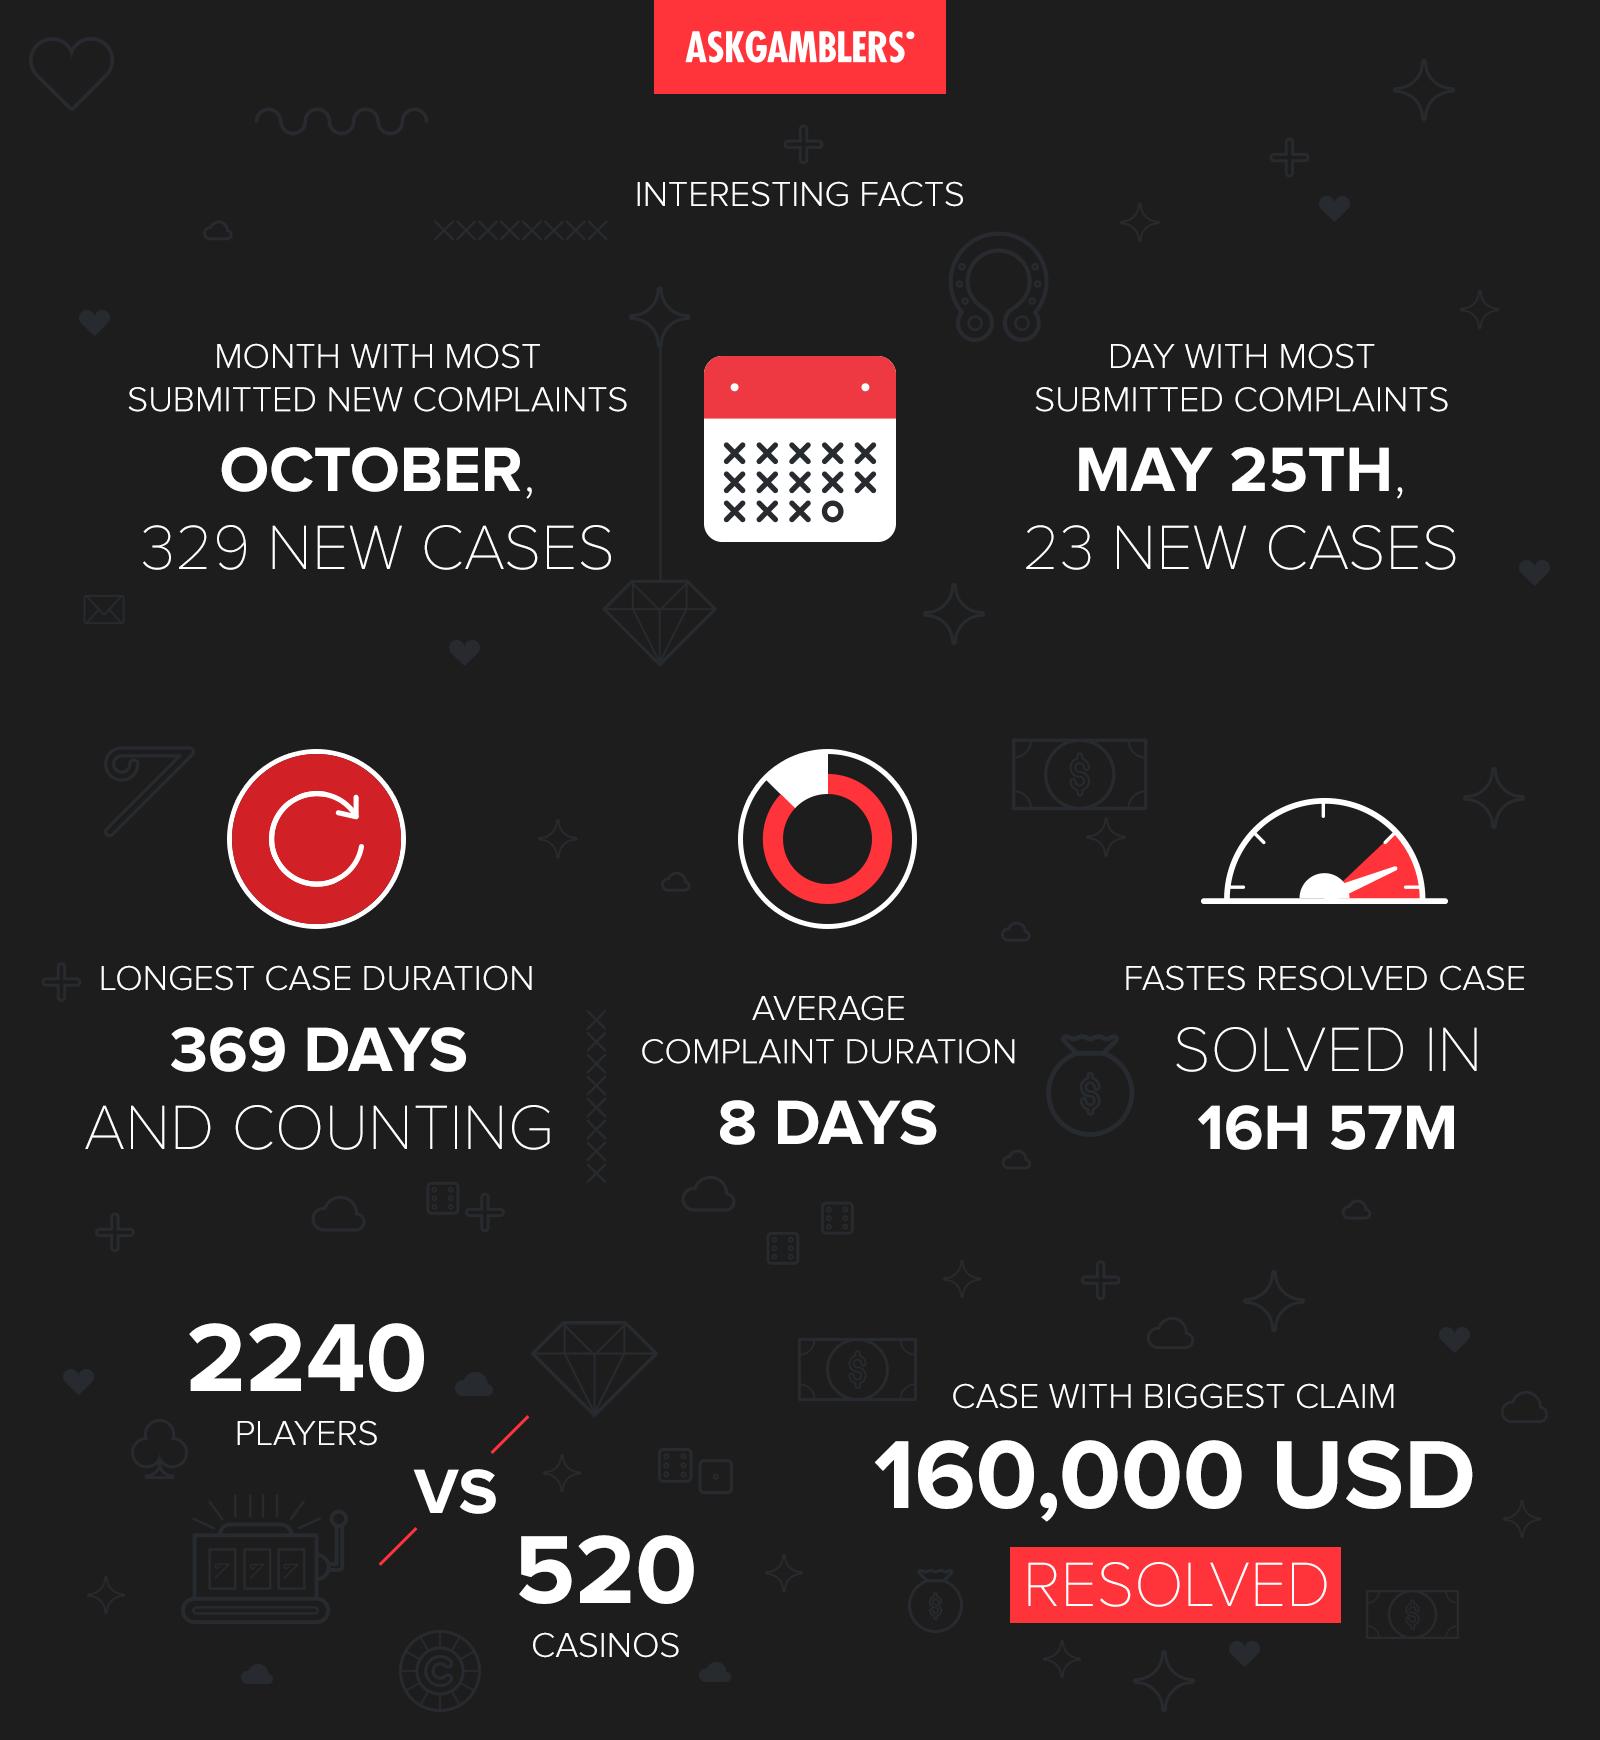 AskGamblers Casino Complaint Service Report for 2015